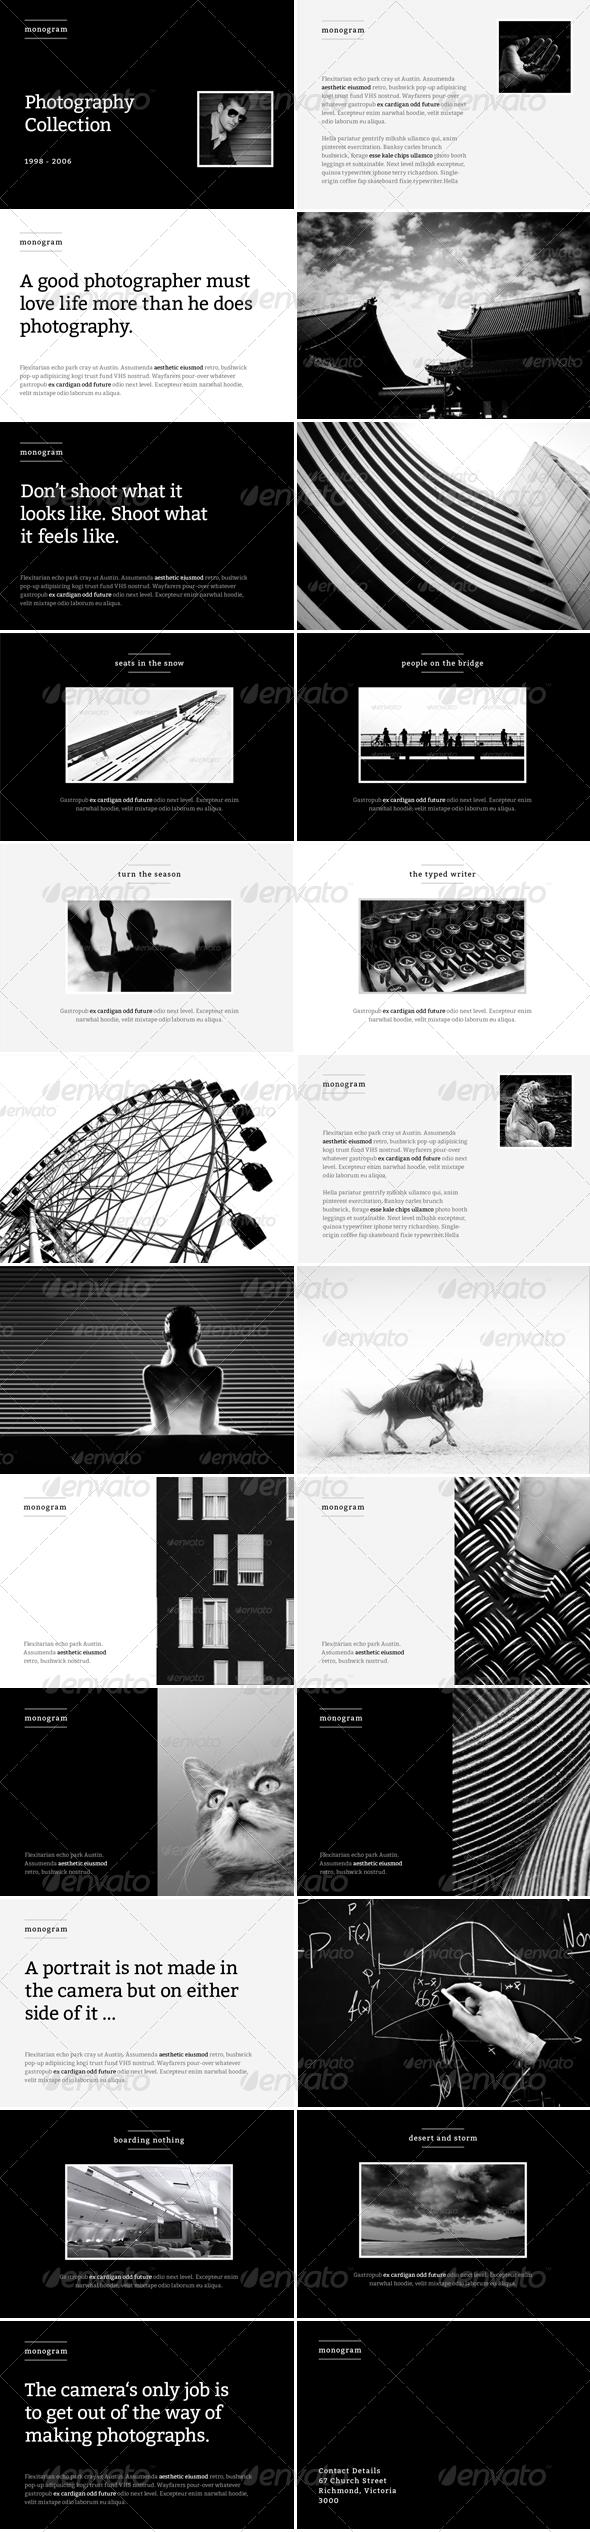 Monogram - Photo Album or Folio Template - Photo Albums Print Templates